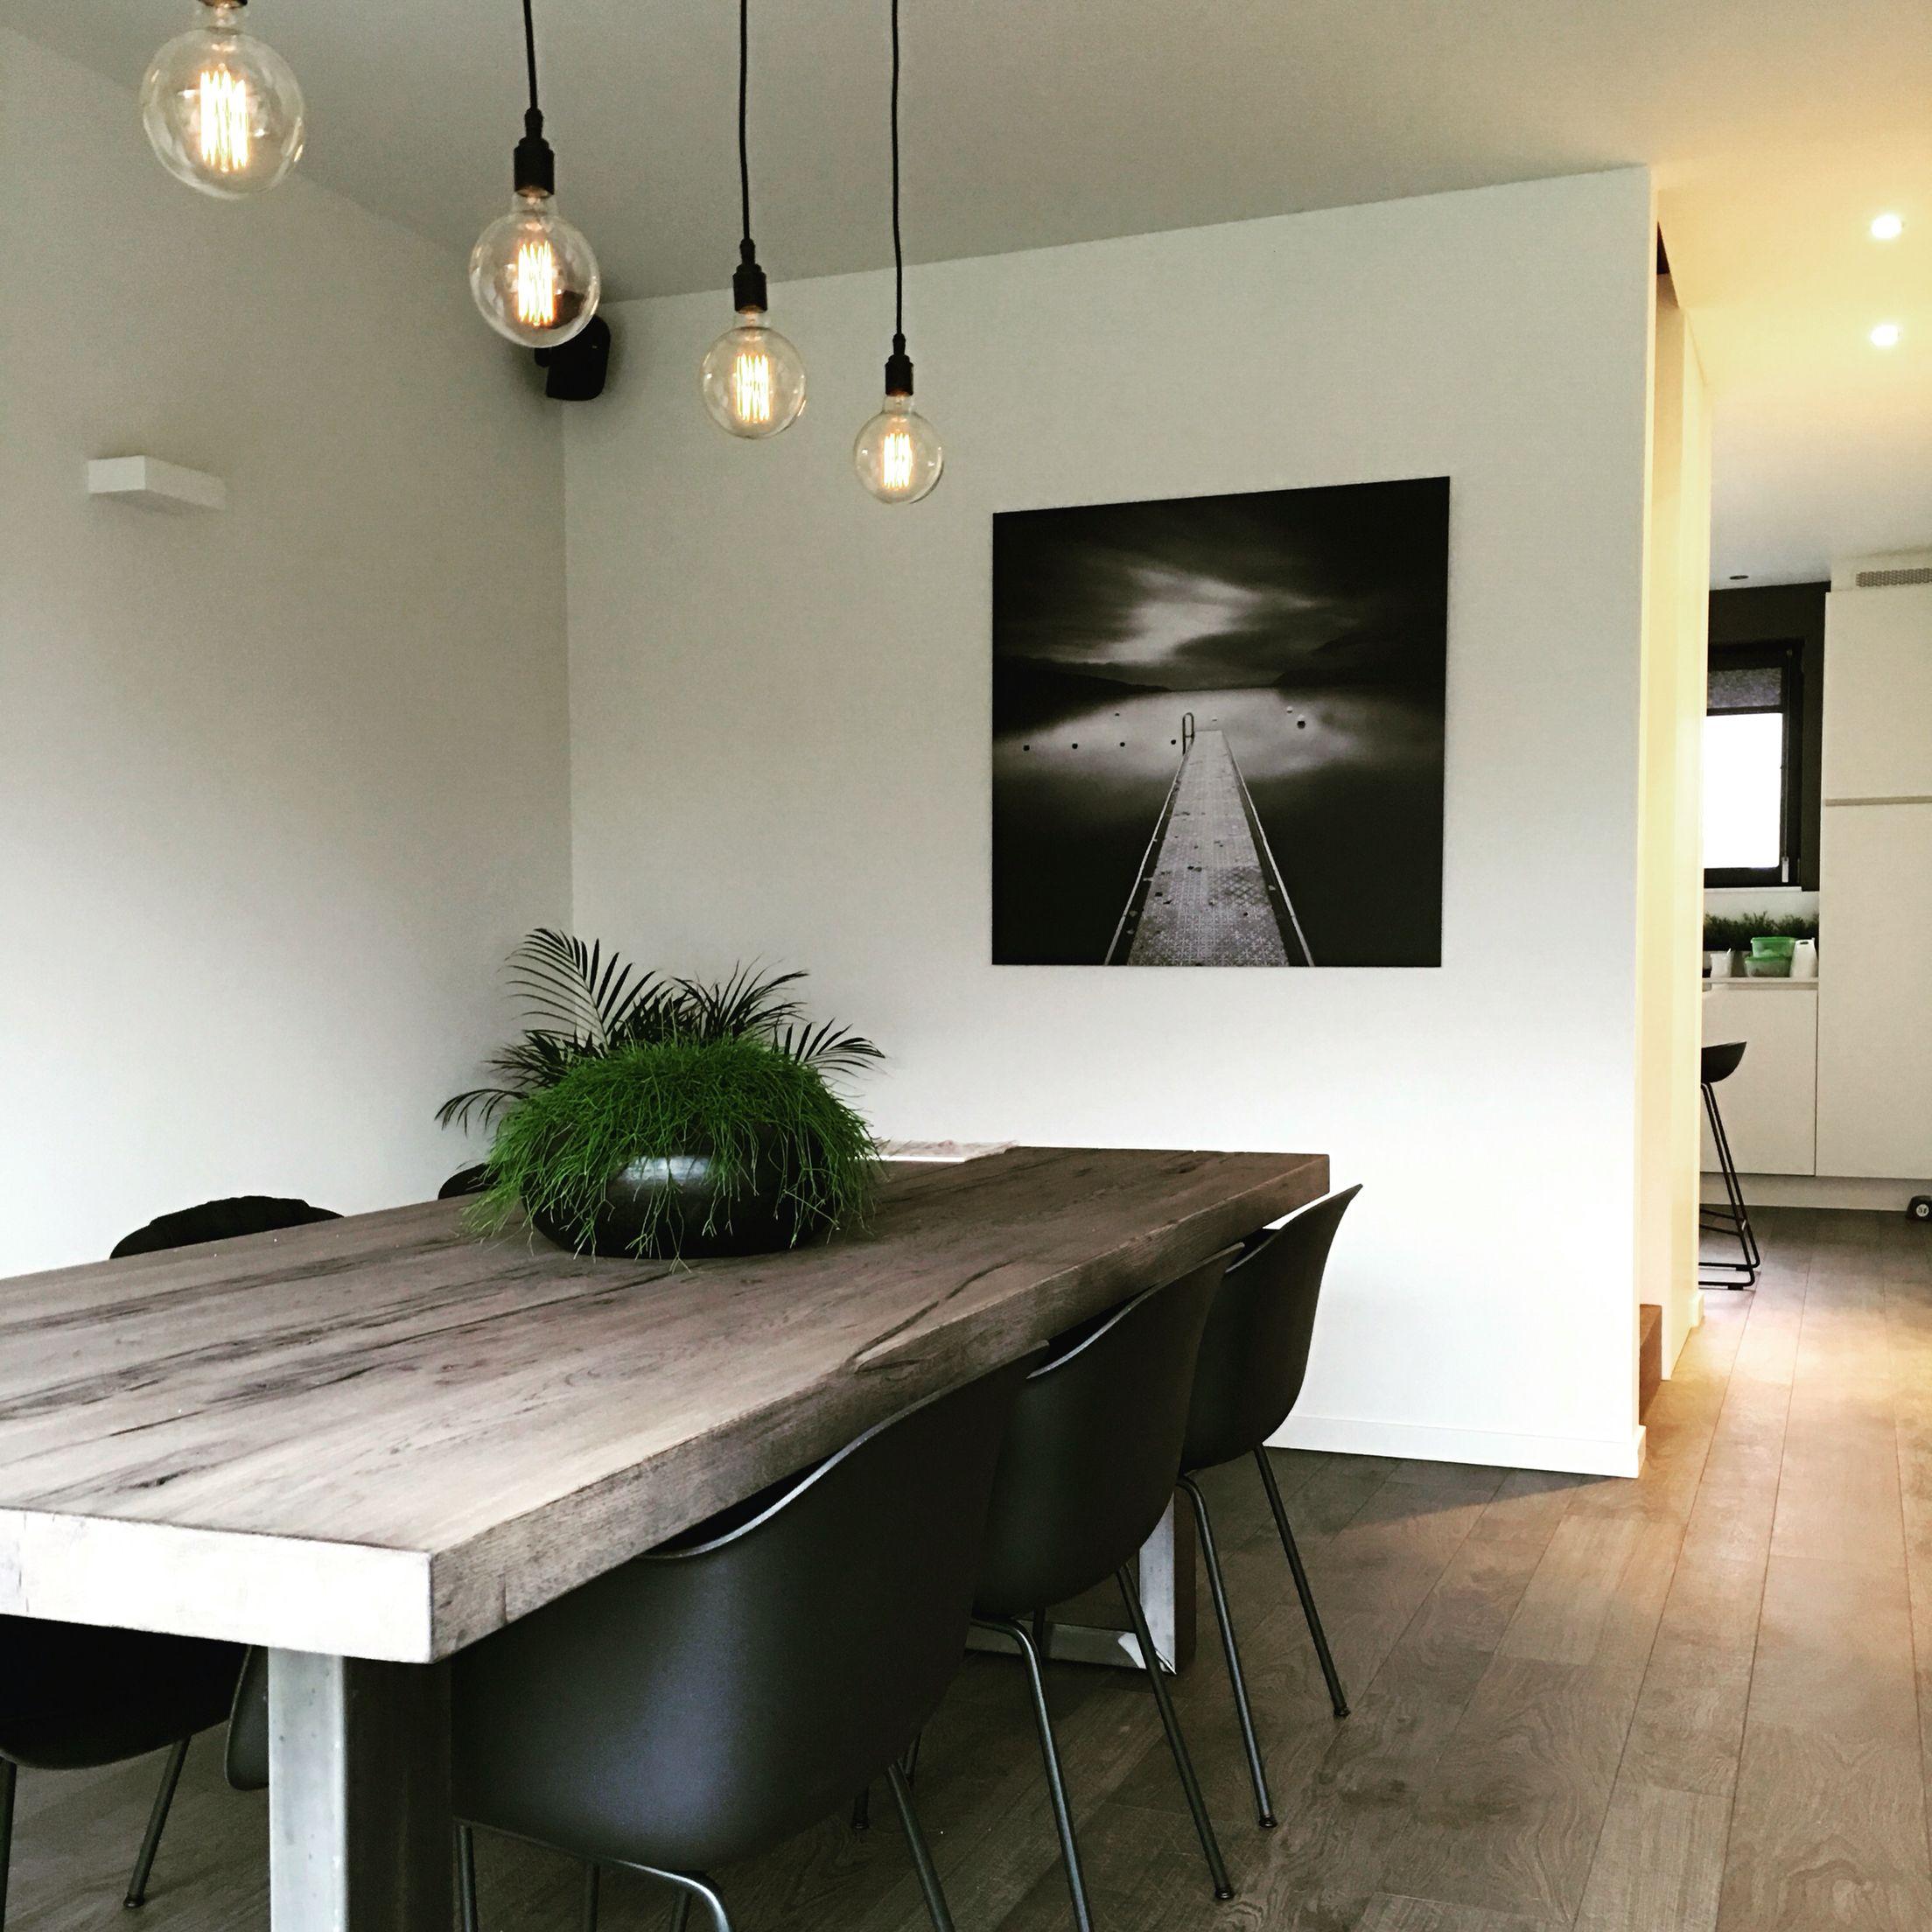 Verlichting eetkamer | Dream home | Pinterest - Eetkamer ...